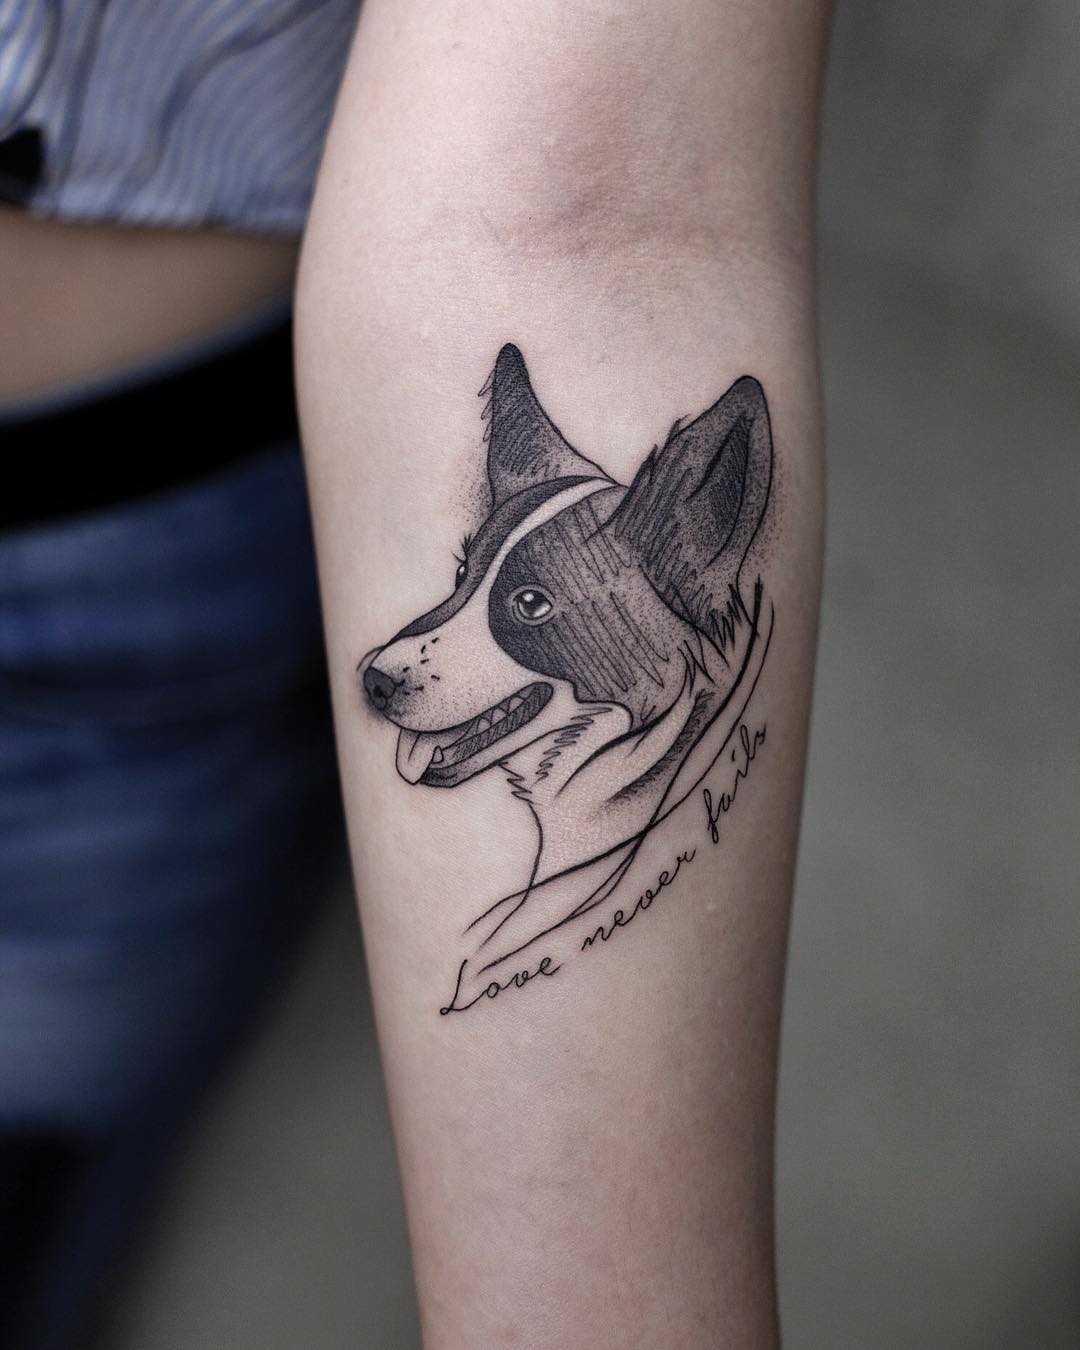 Love never fails tattoo by Aki Wong